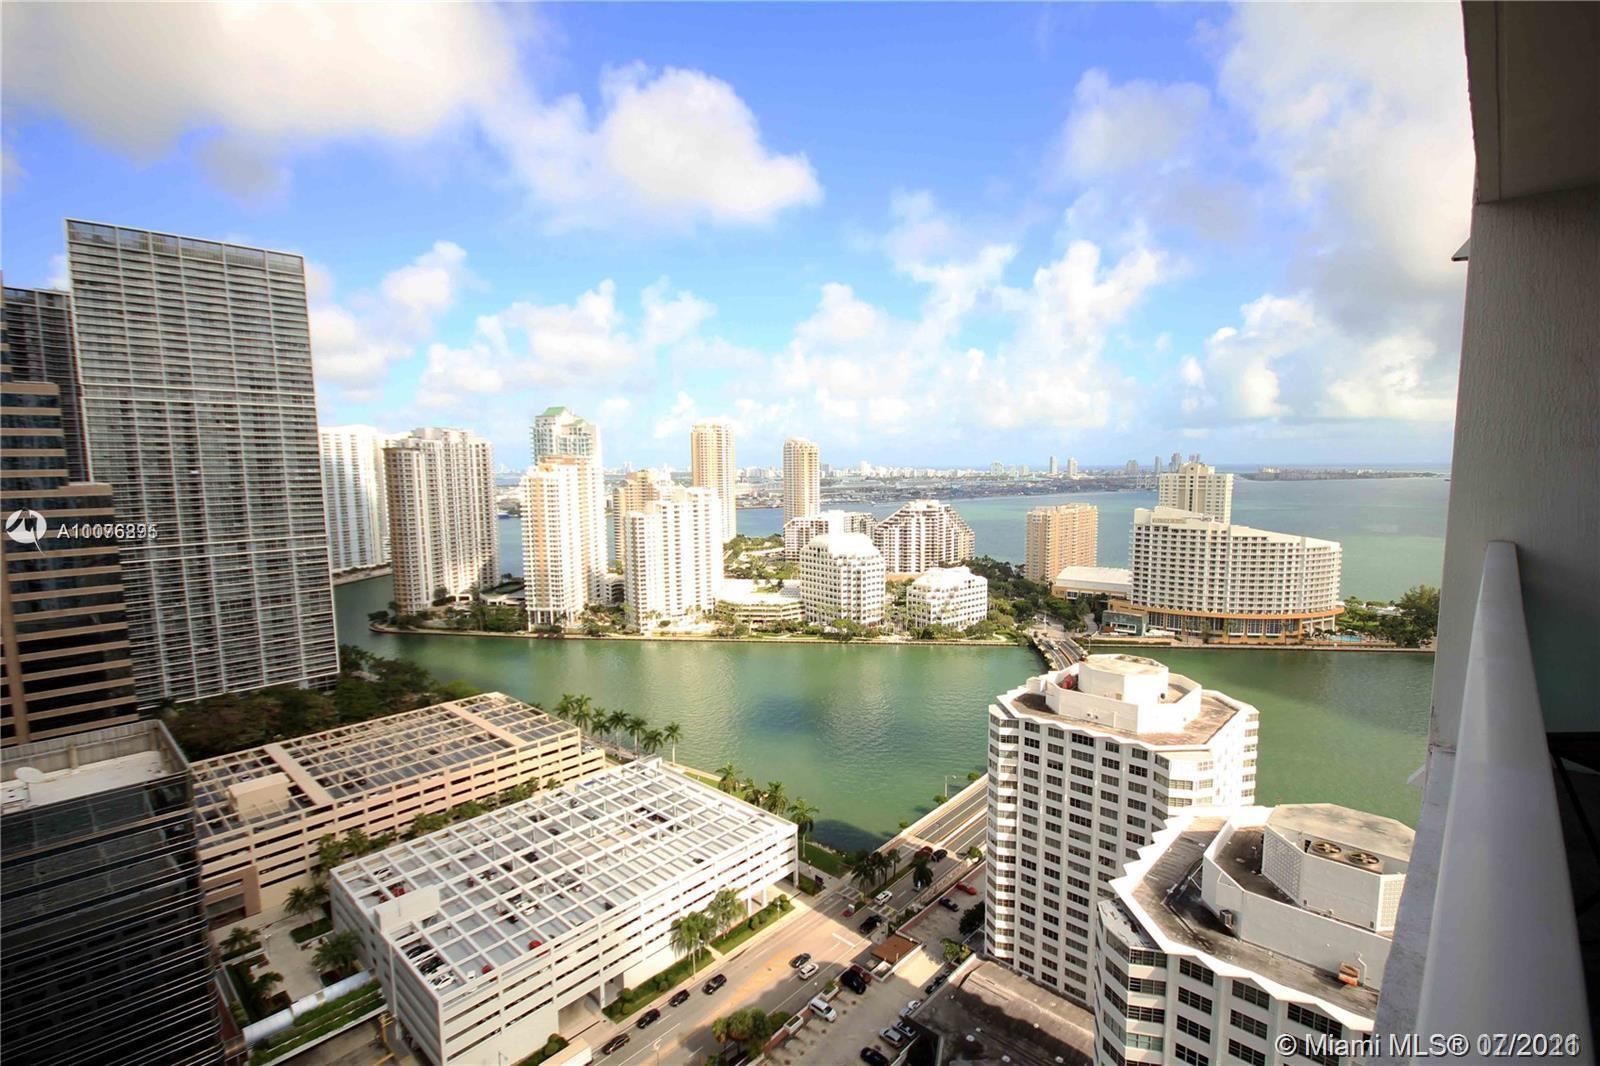 The Plaza on Brickell 1 #3308 - 950 Brickell Bay Dr #3308, Miami, FL 33131